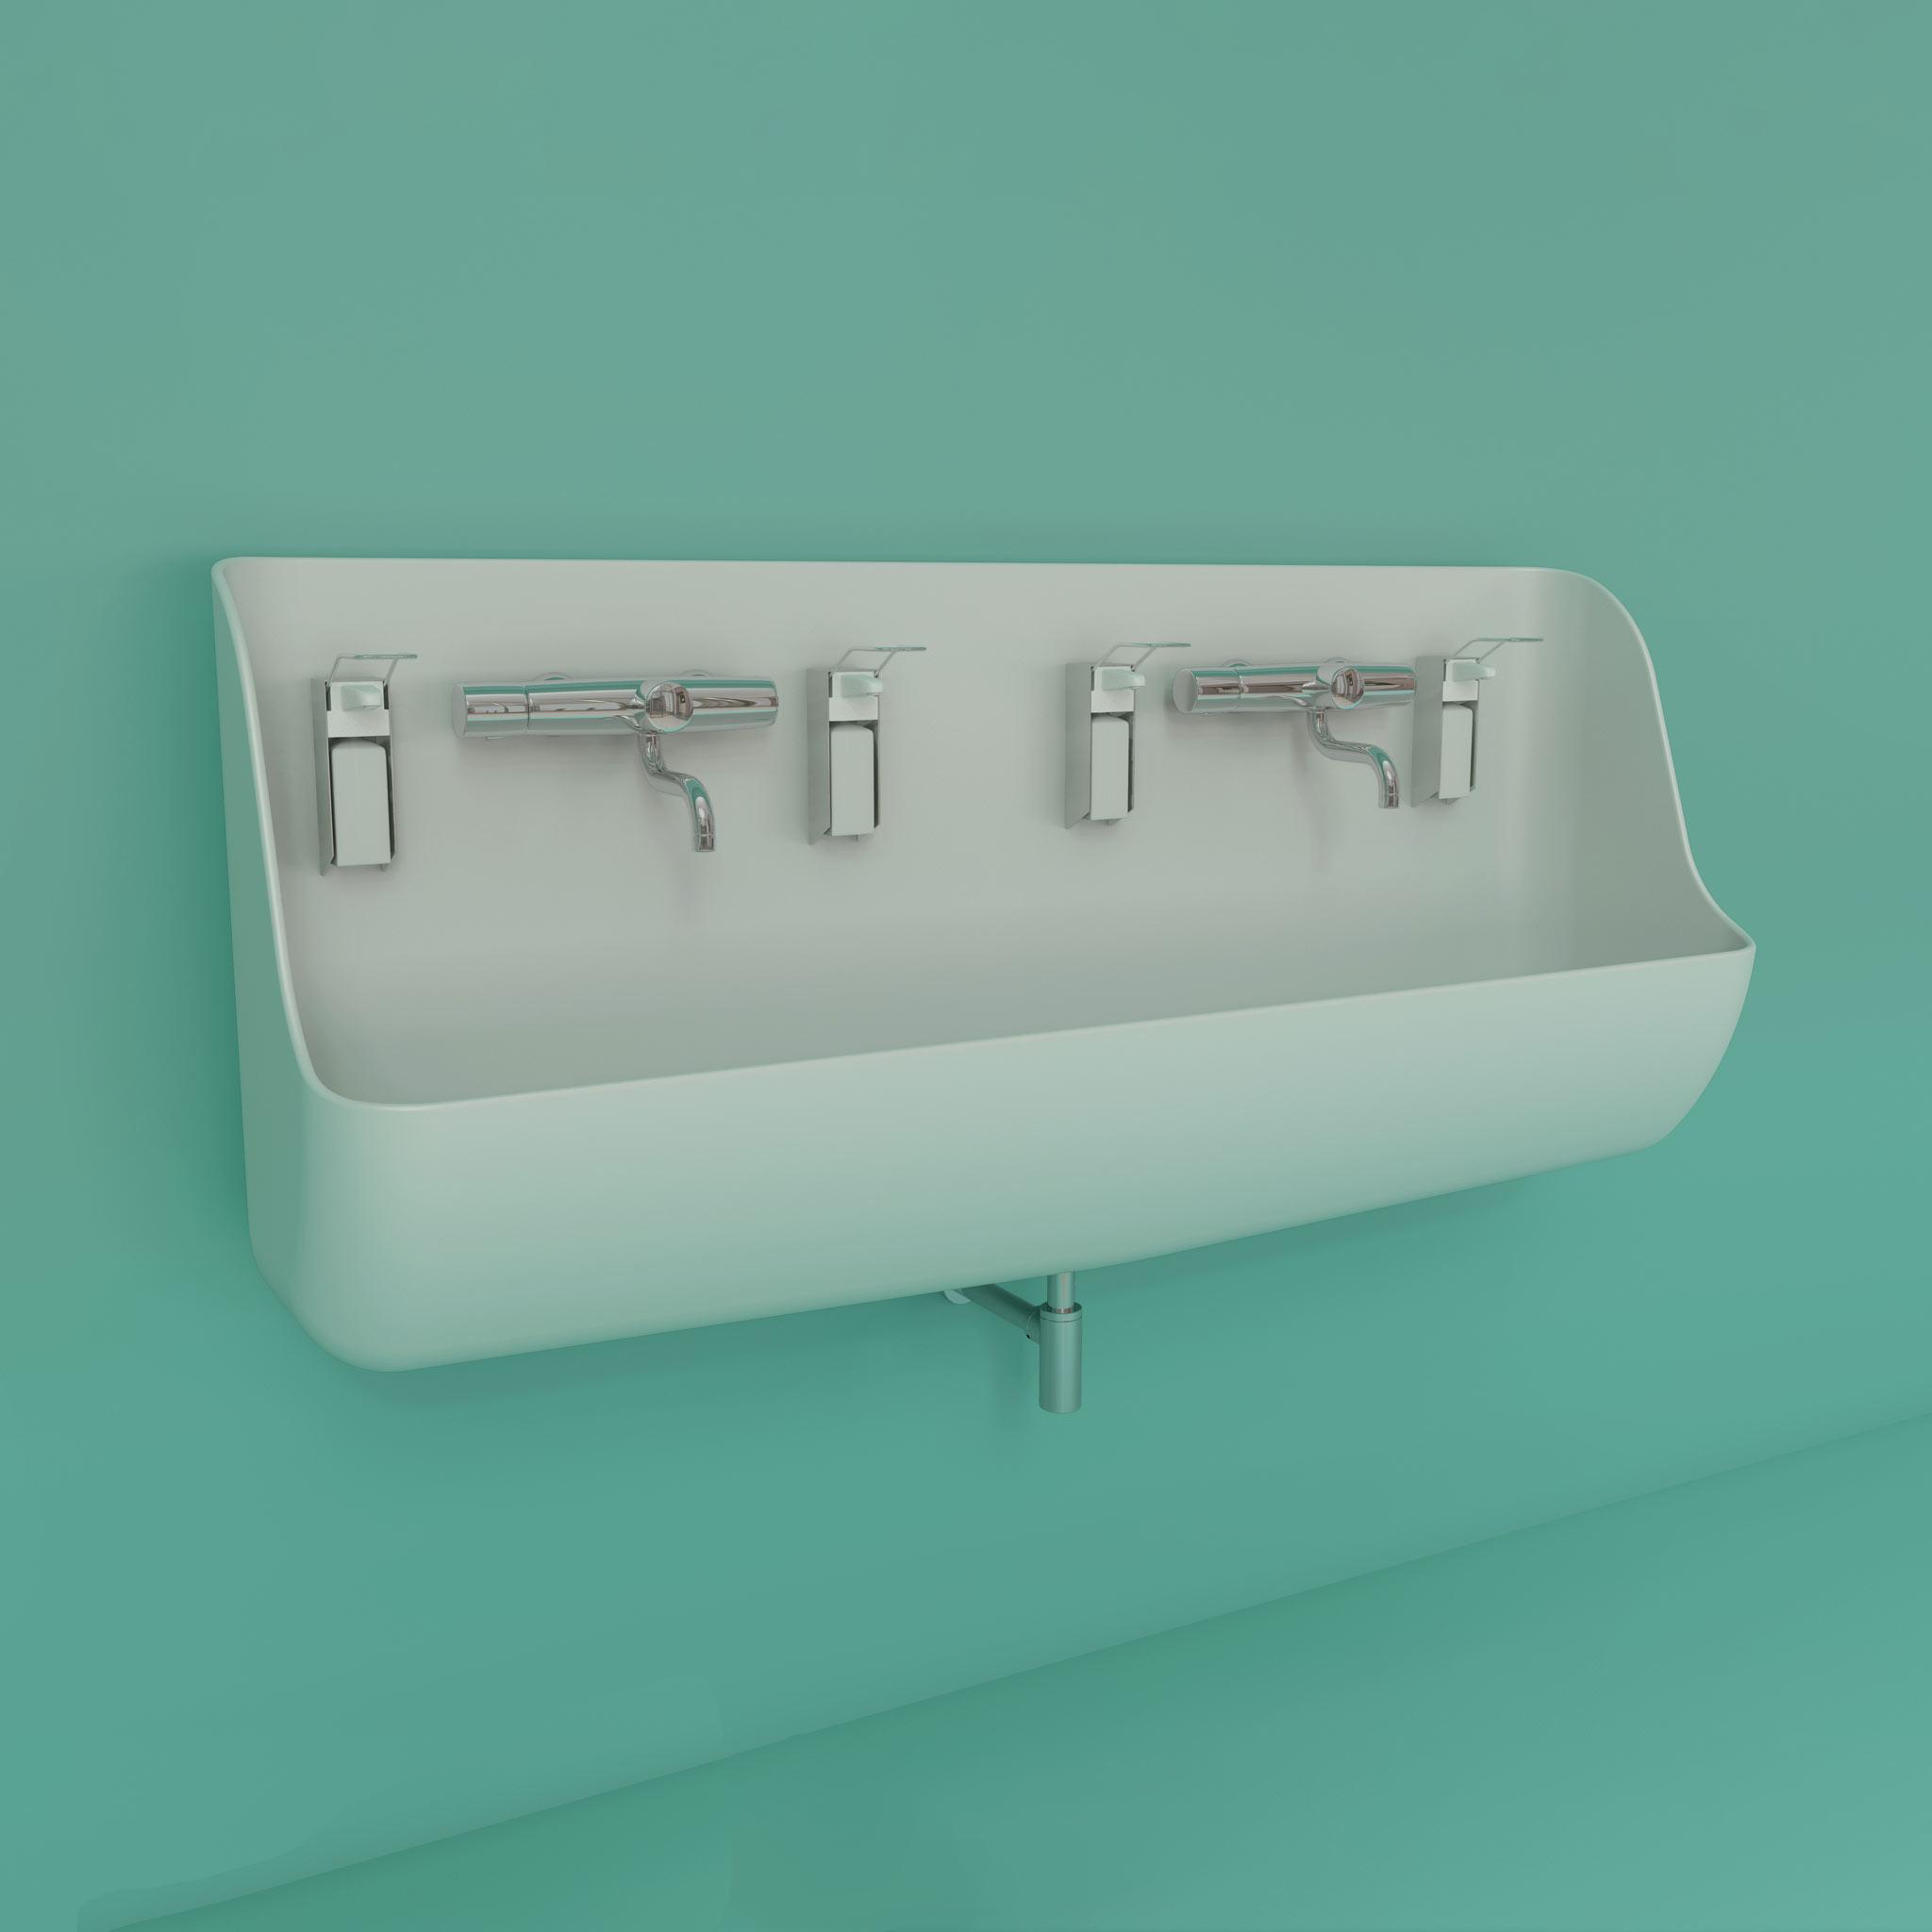 ABRA series scrub sinks